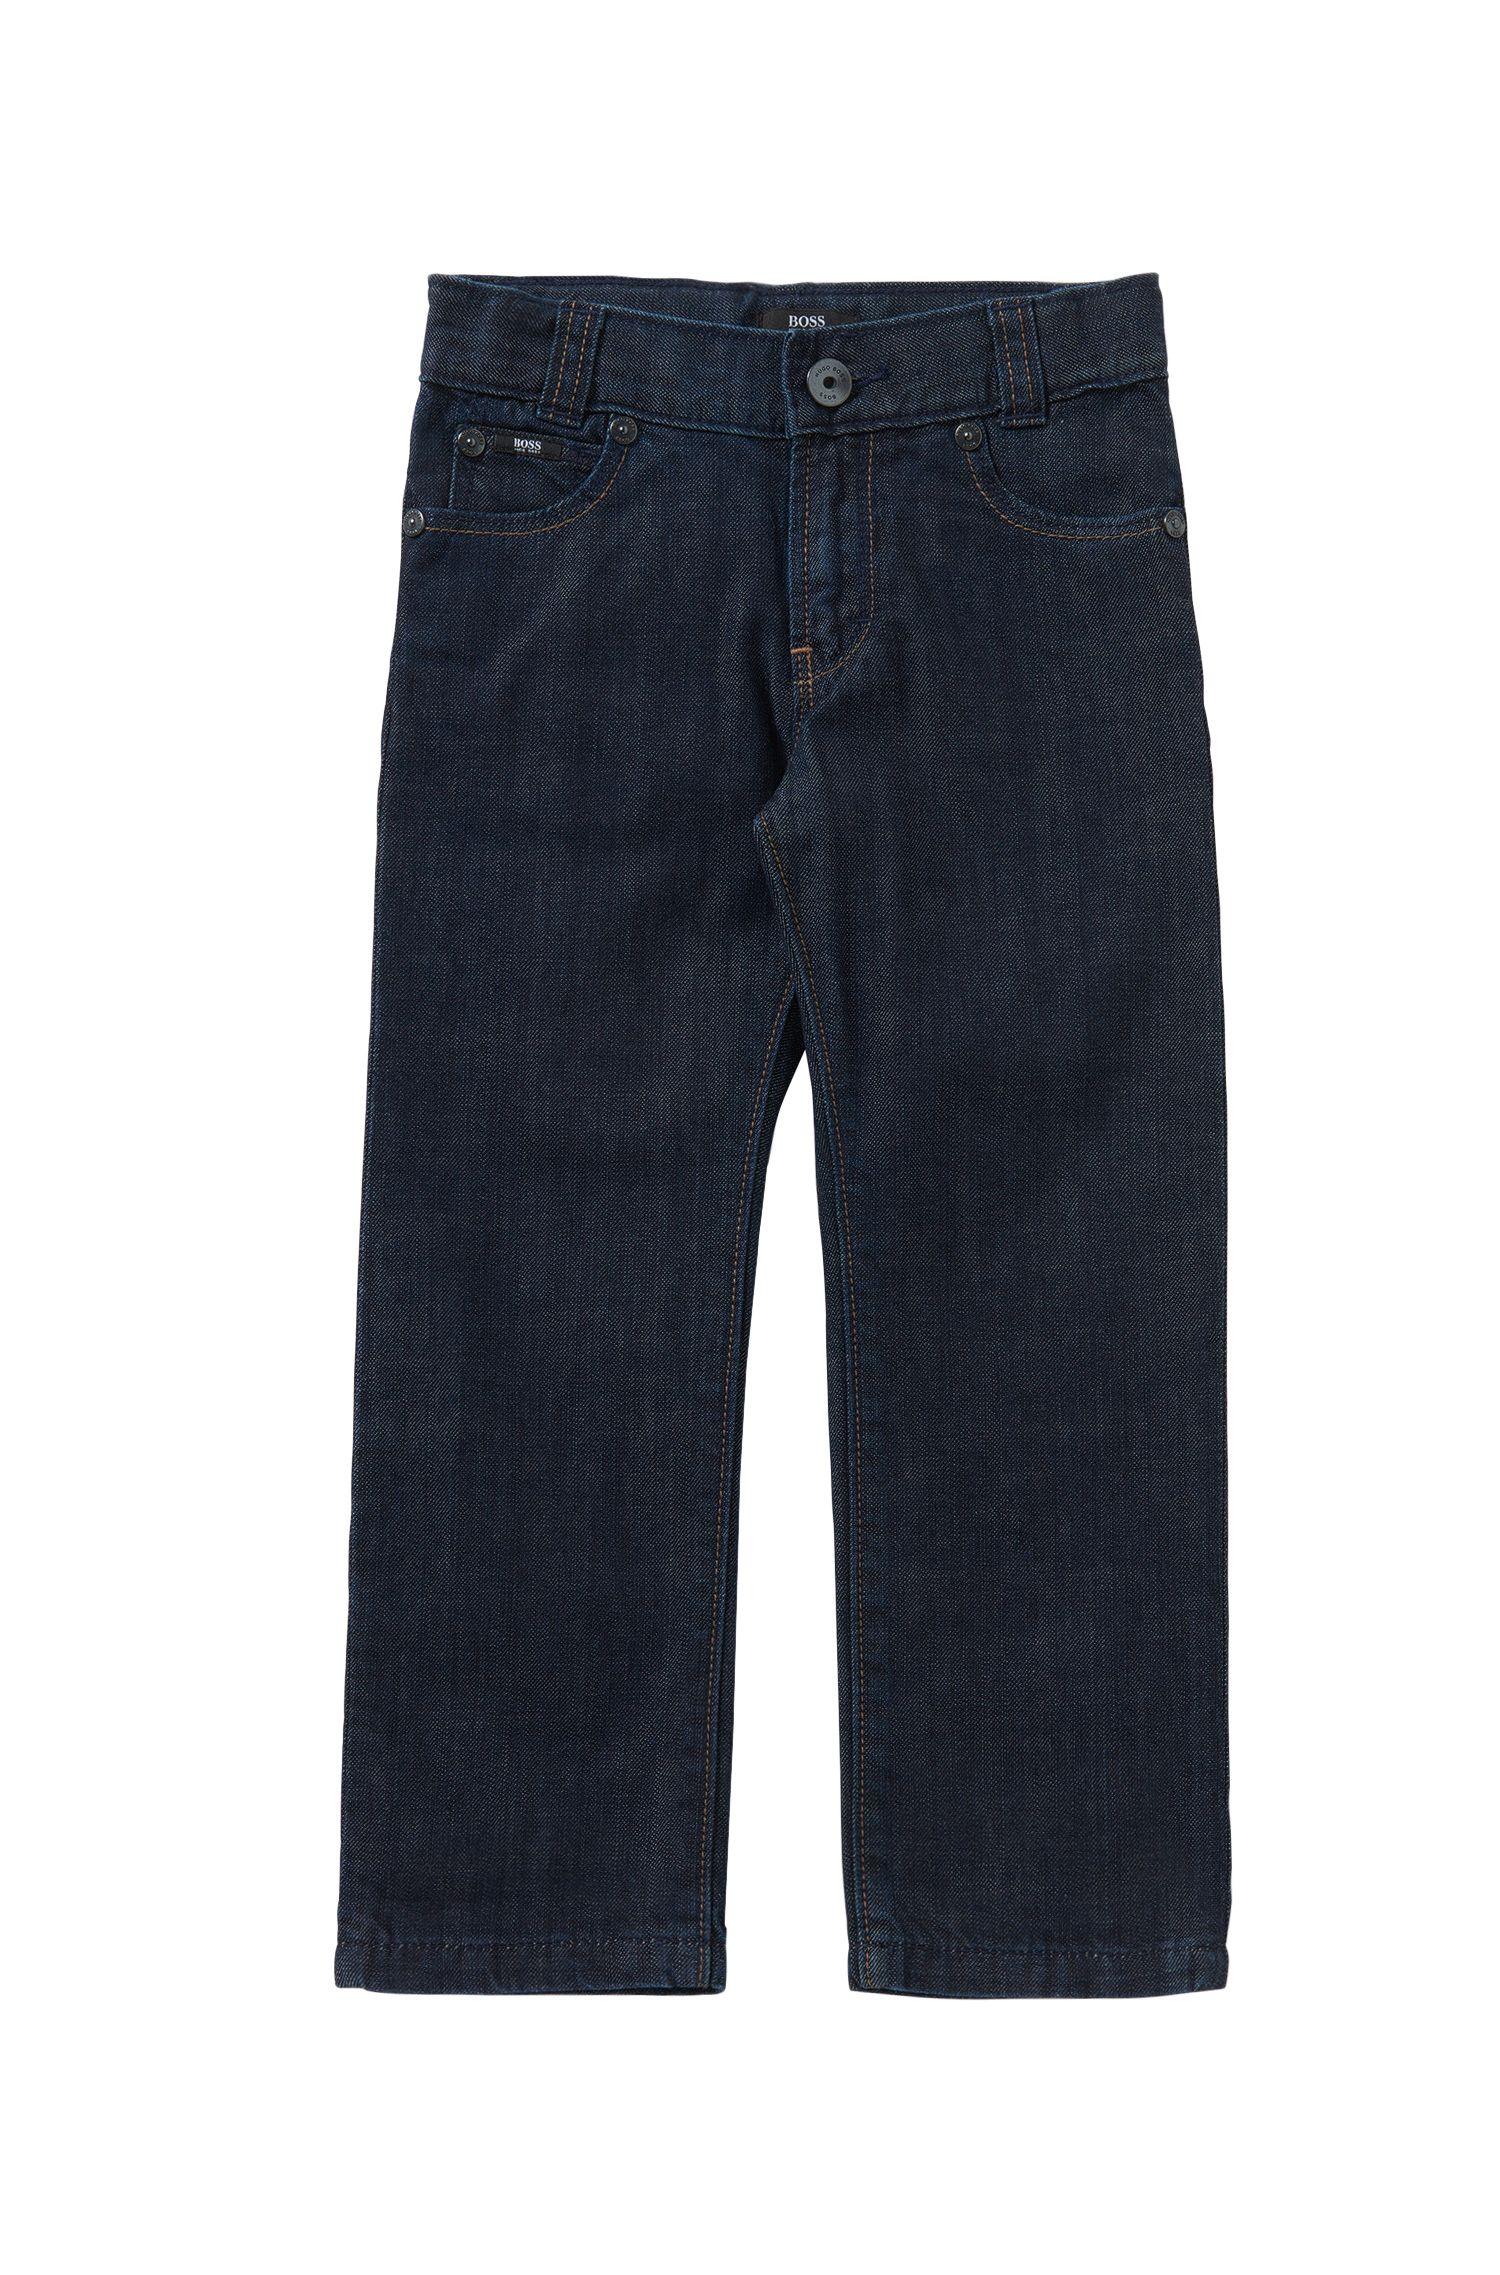 'Alabama' | Boys Cotton Jeans